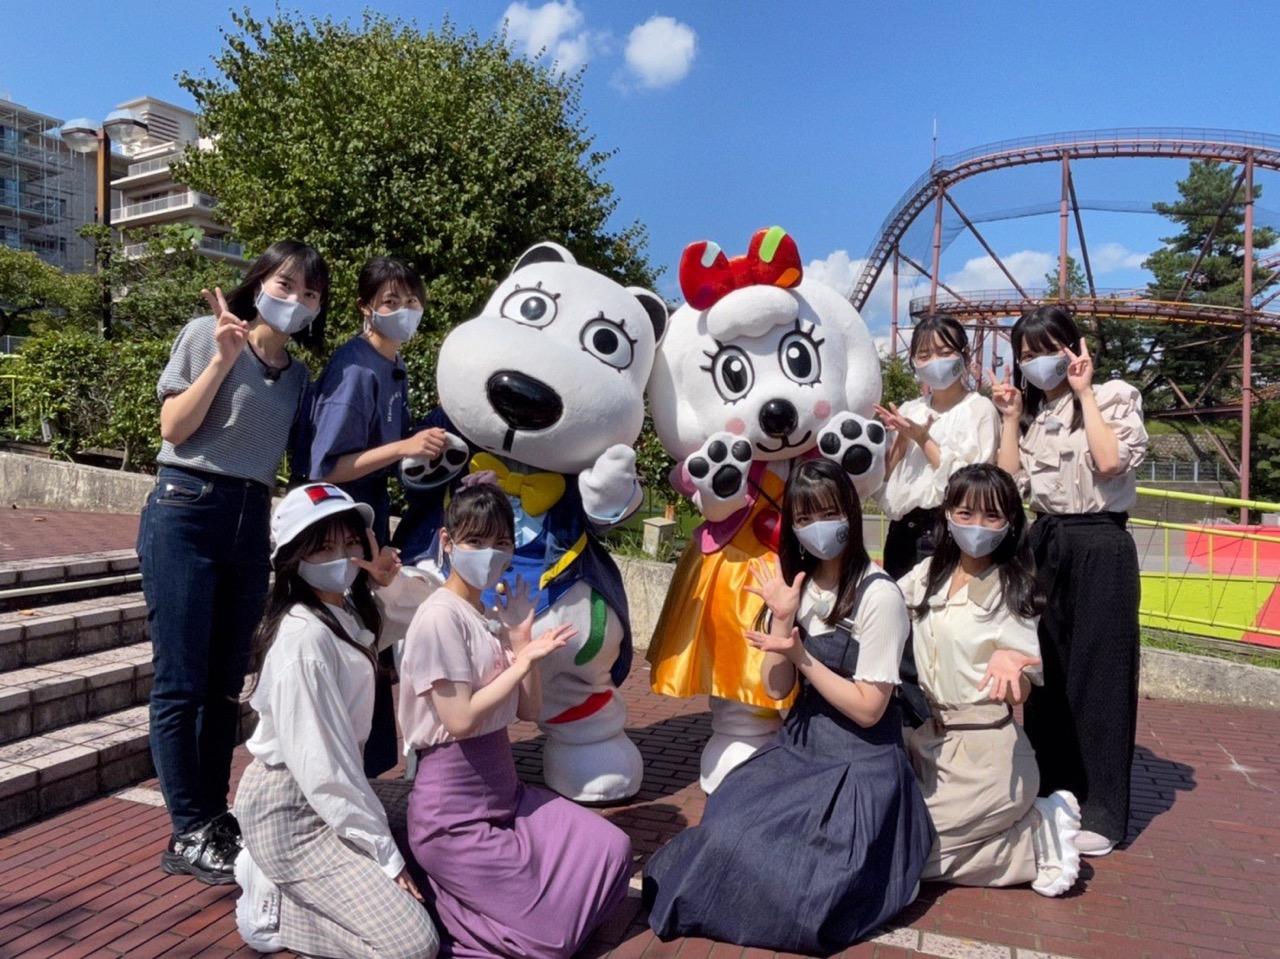 「STU48のガチンコバトル!」メンバー8名がよみうりランドで対決!【2021.9.30 25:05〜 TOKYO MX】